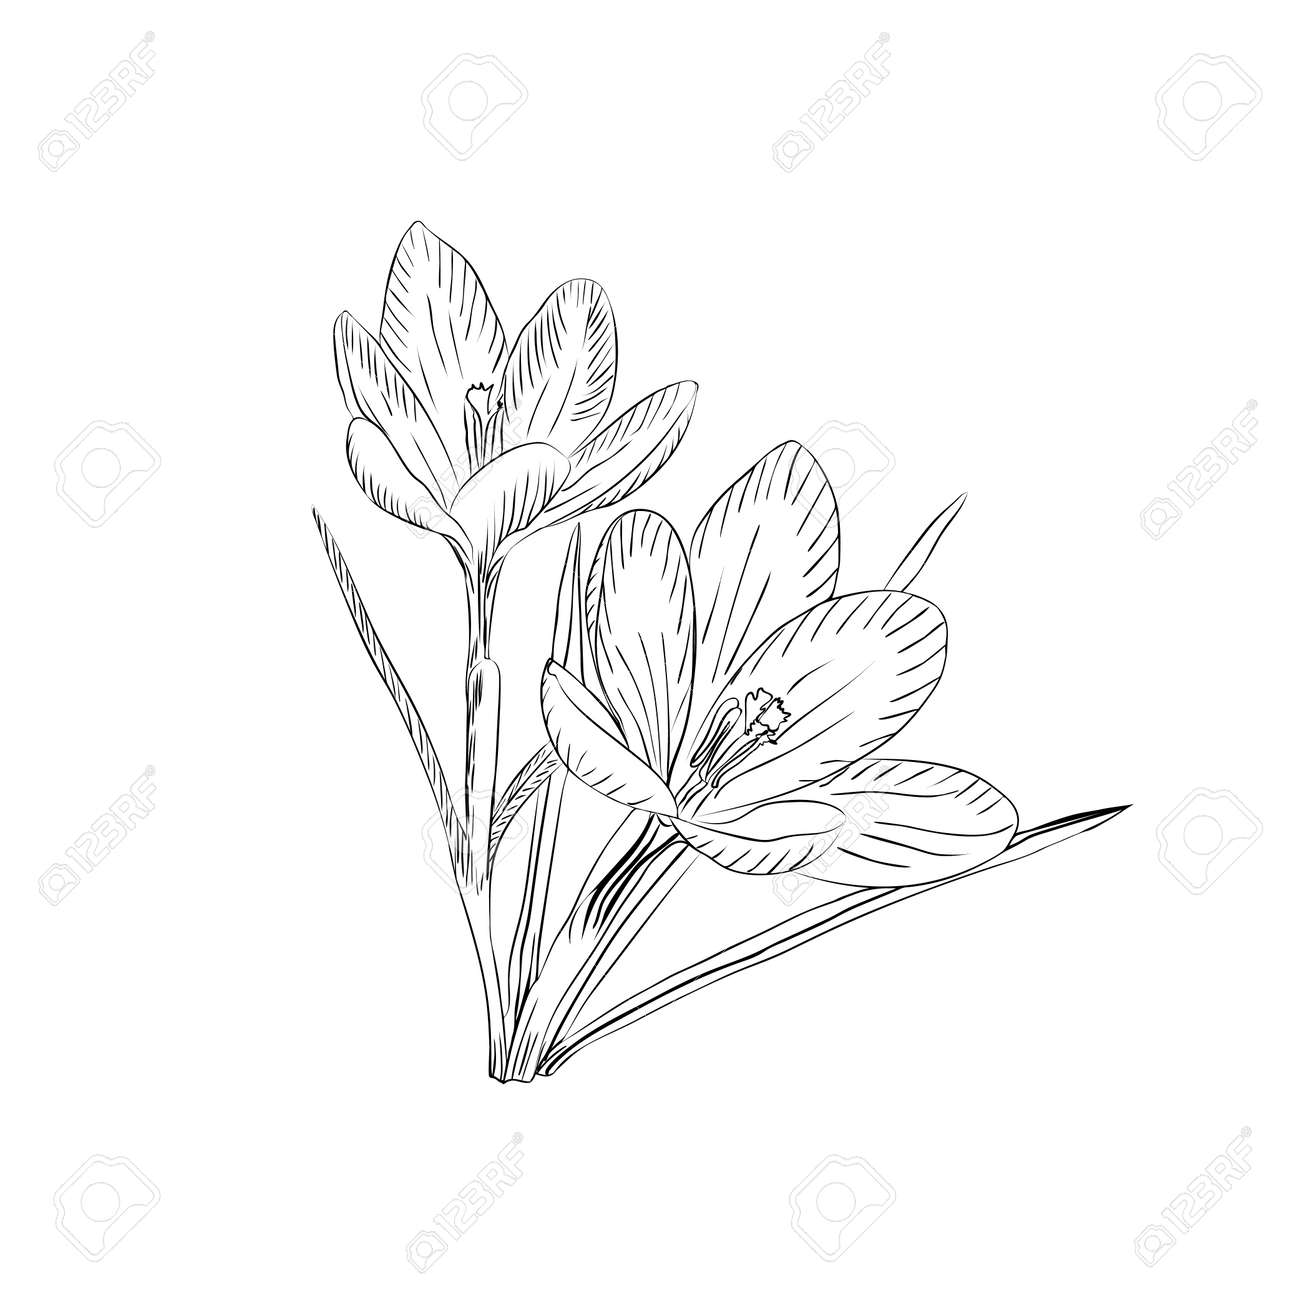 Hand drawn crocus flowers. Elegant vintage card. Vector illustration. - 46641784